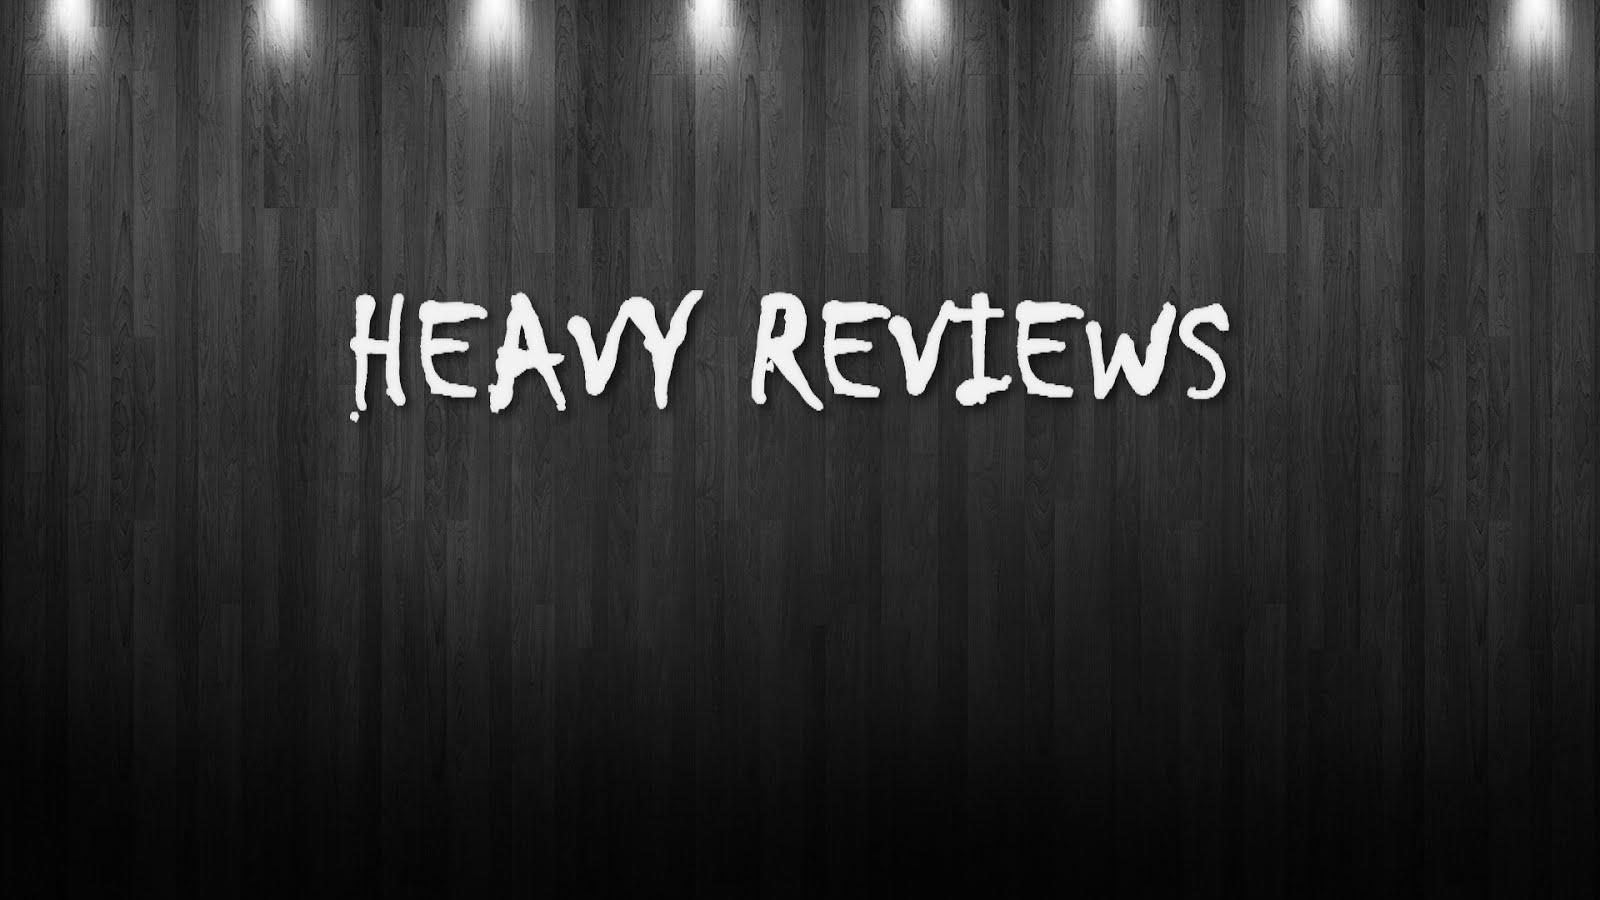 Heavy Reviews